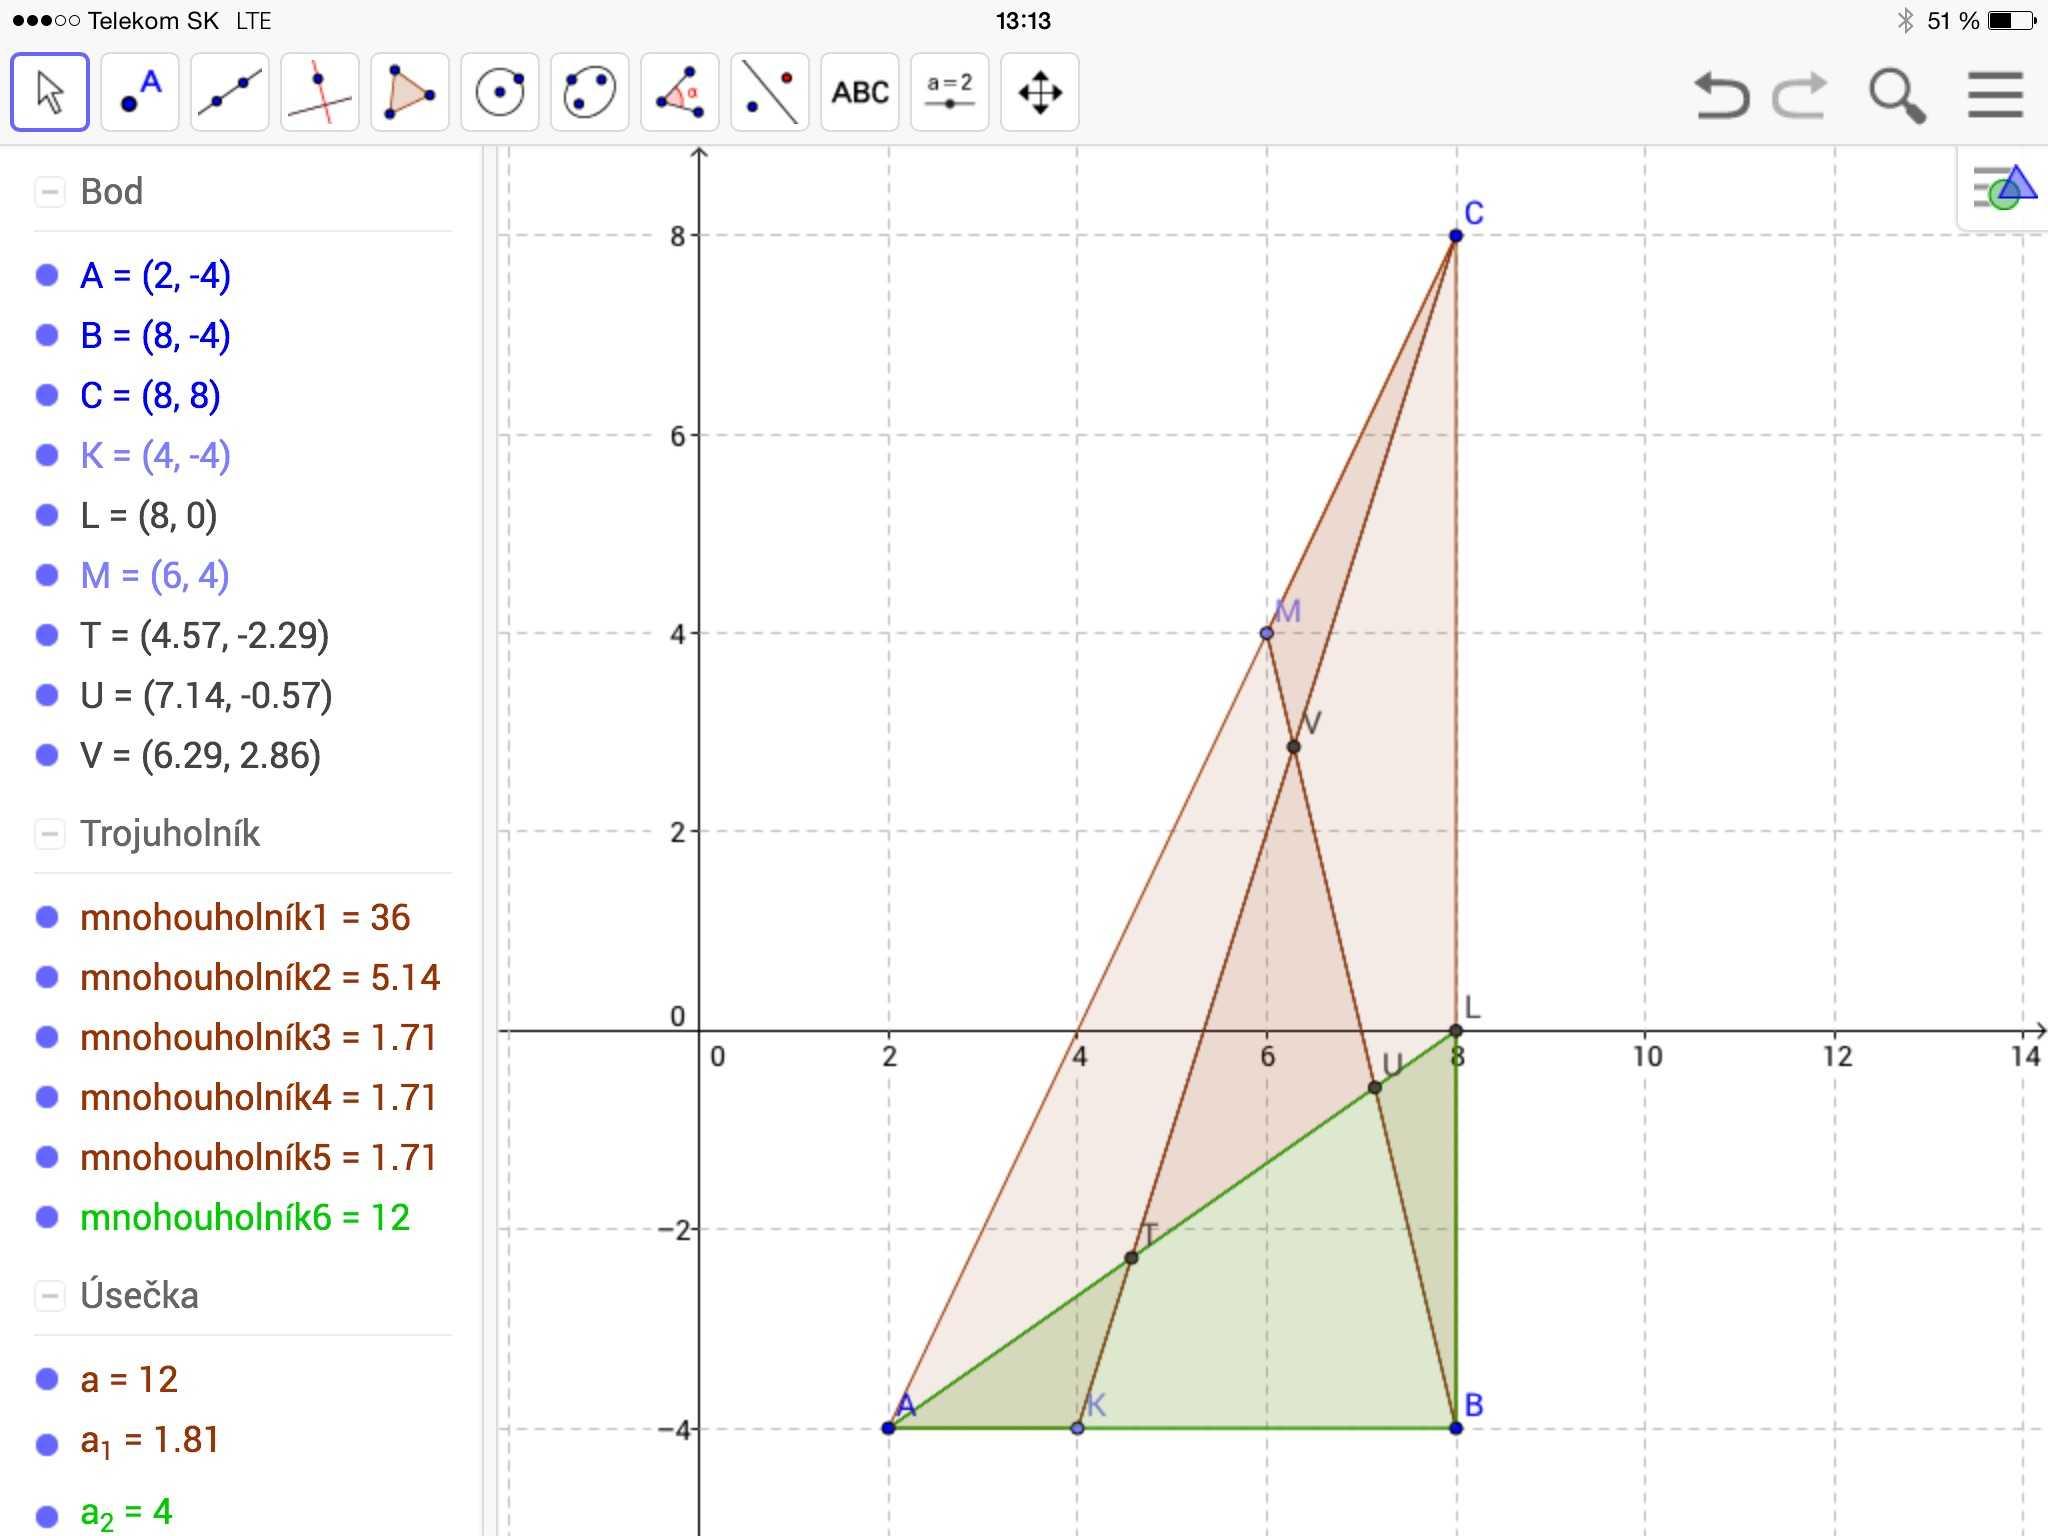 http://forum.matematika.cz/upload3/img/2015-04/23774_image.jpg